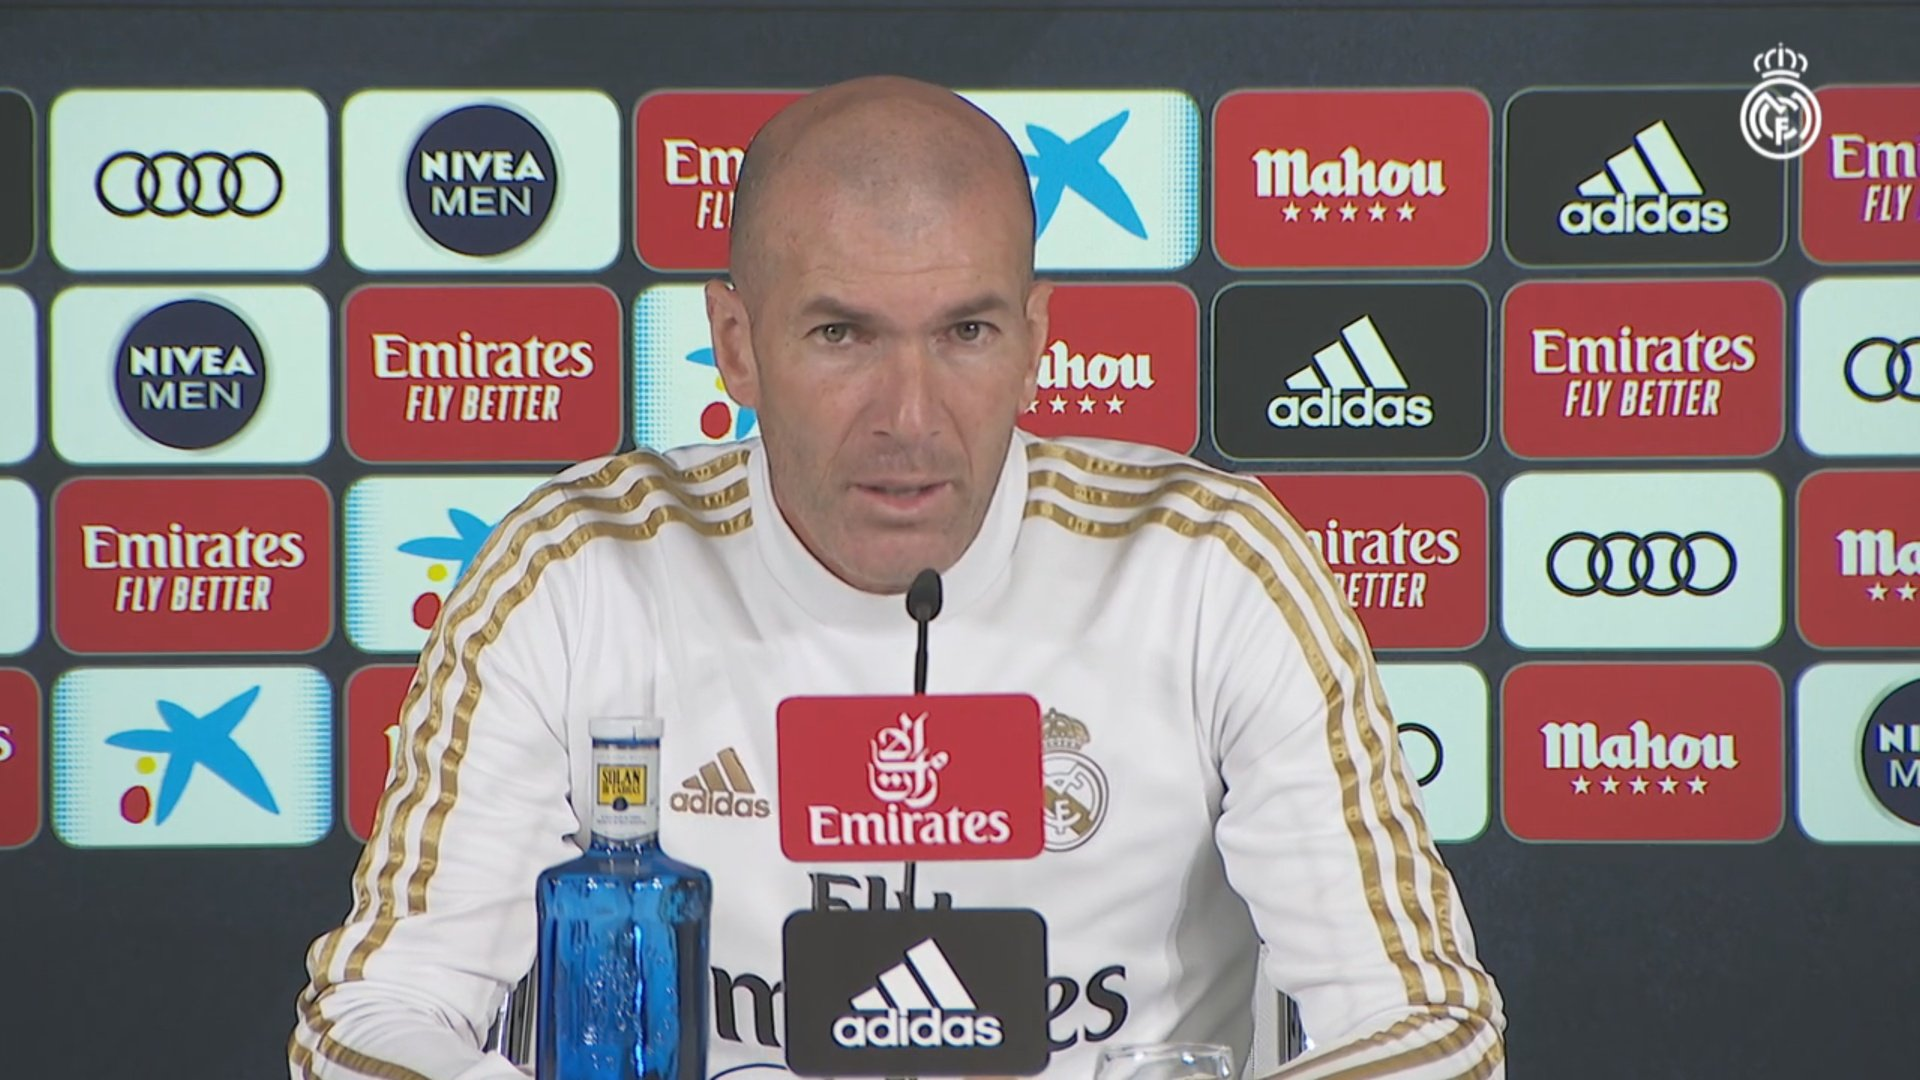 Zidane on Celta Vigo, Hazard's return, Man City and more